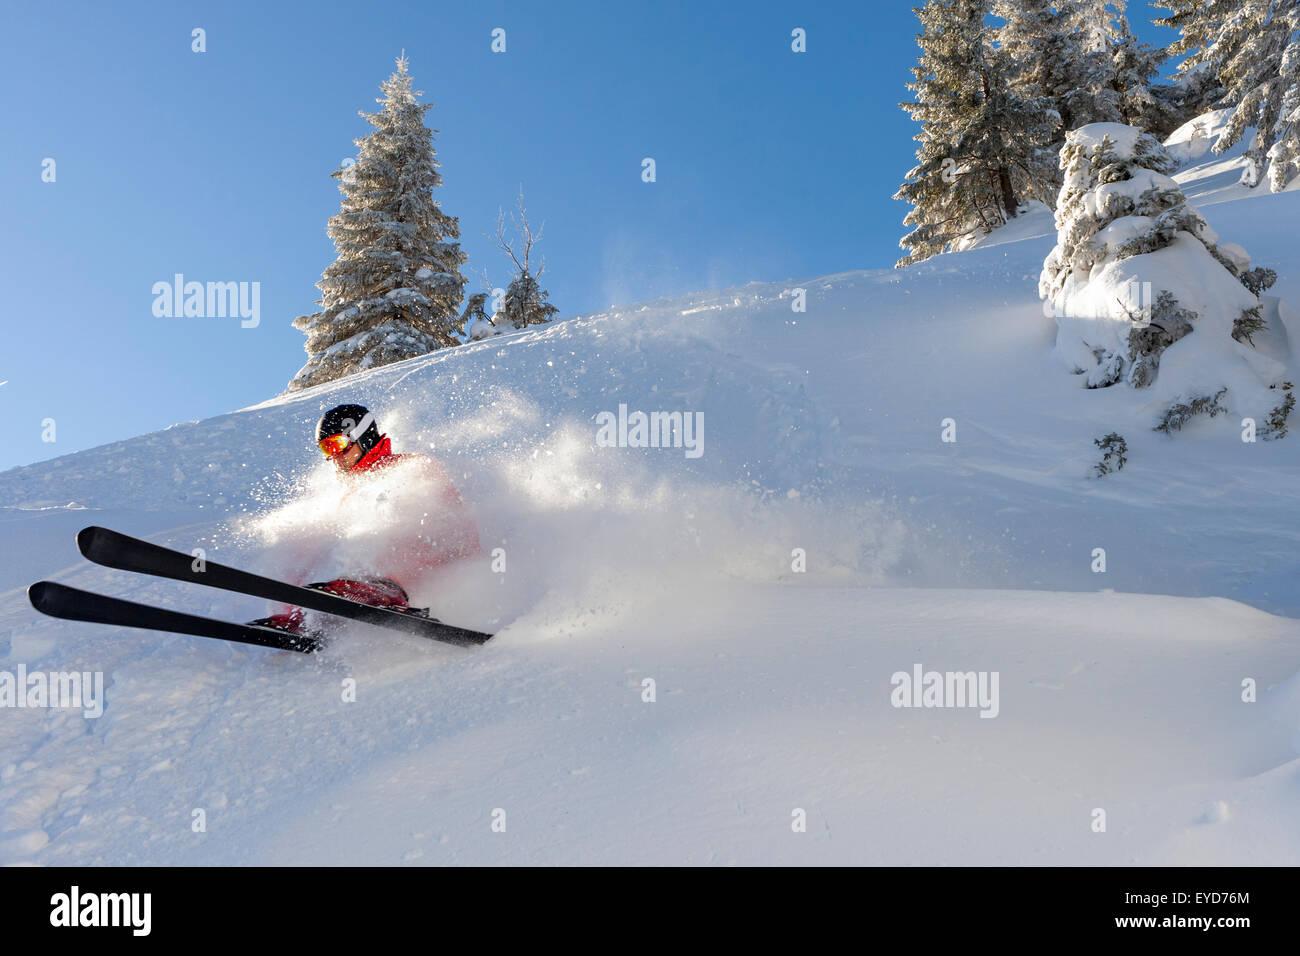 Ski holiday, Man skiing downhill, Sudelfeld, Bavaria, Germany - Stock Image